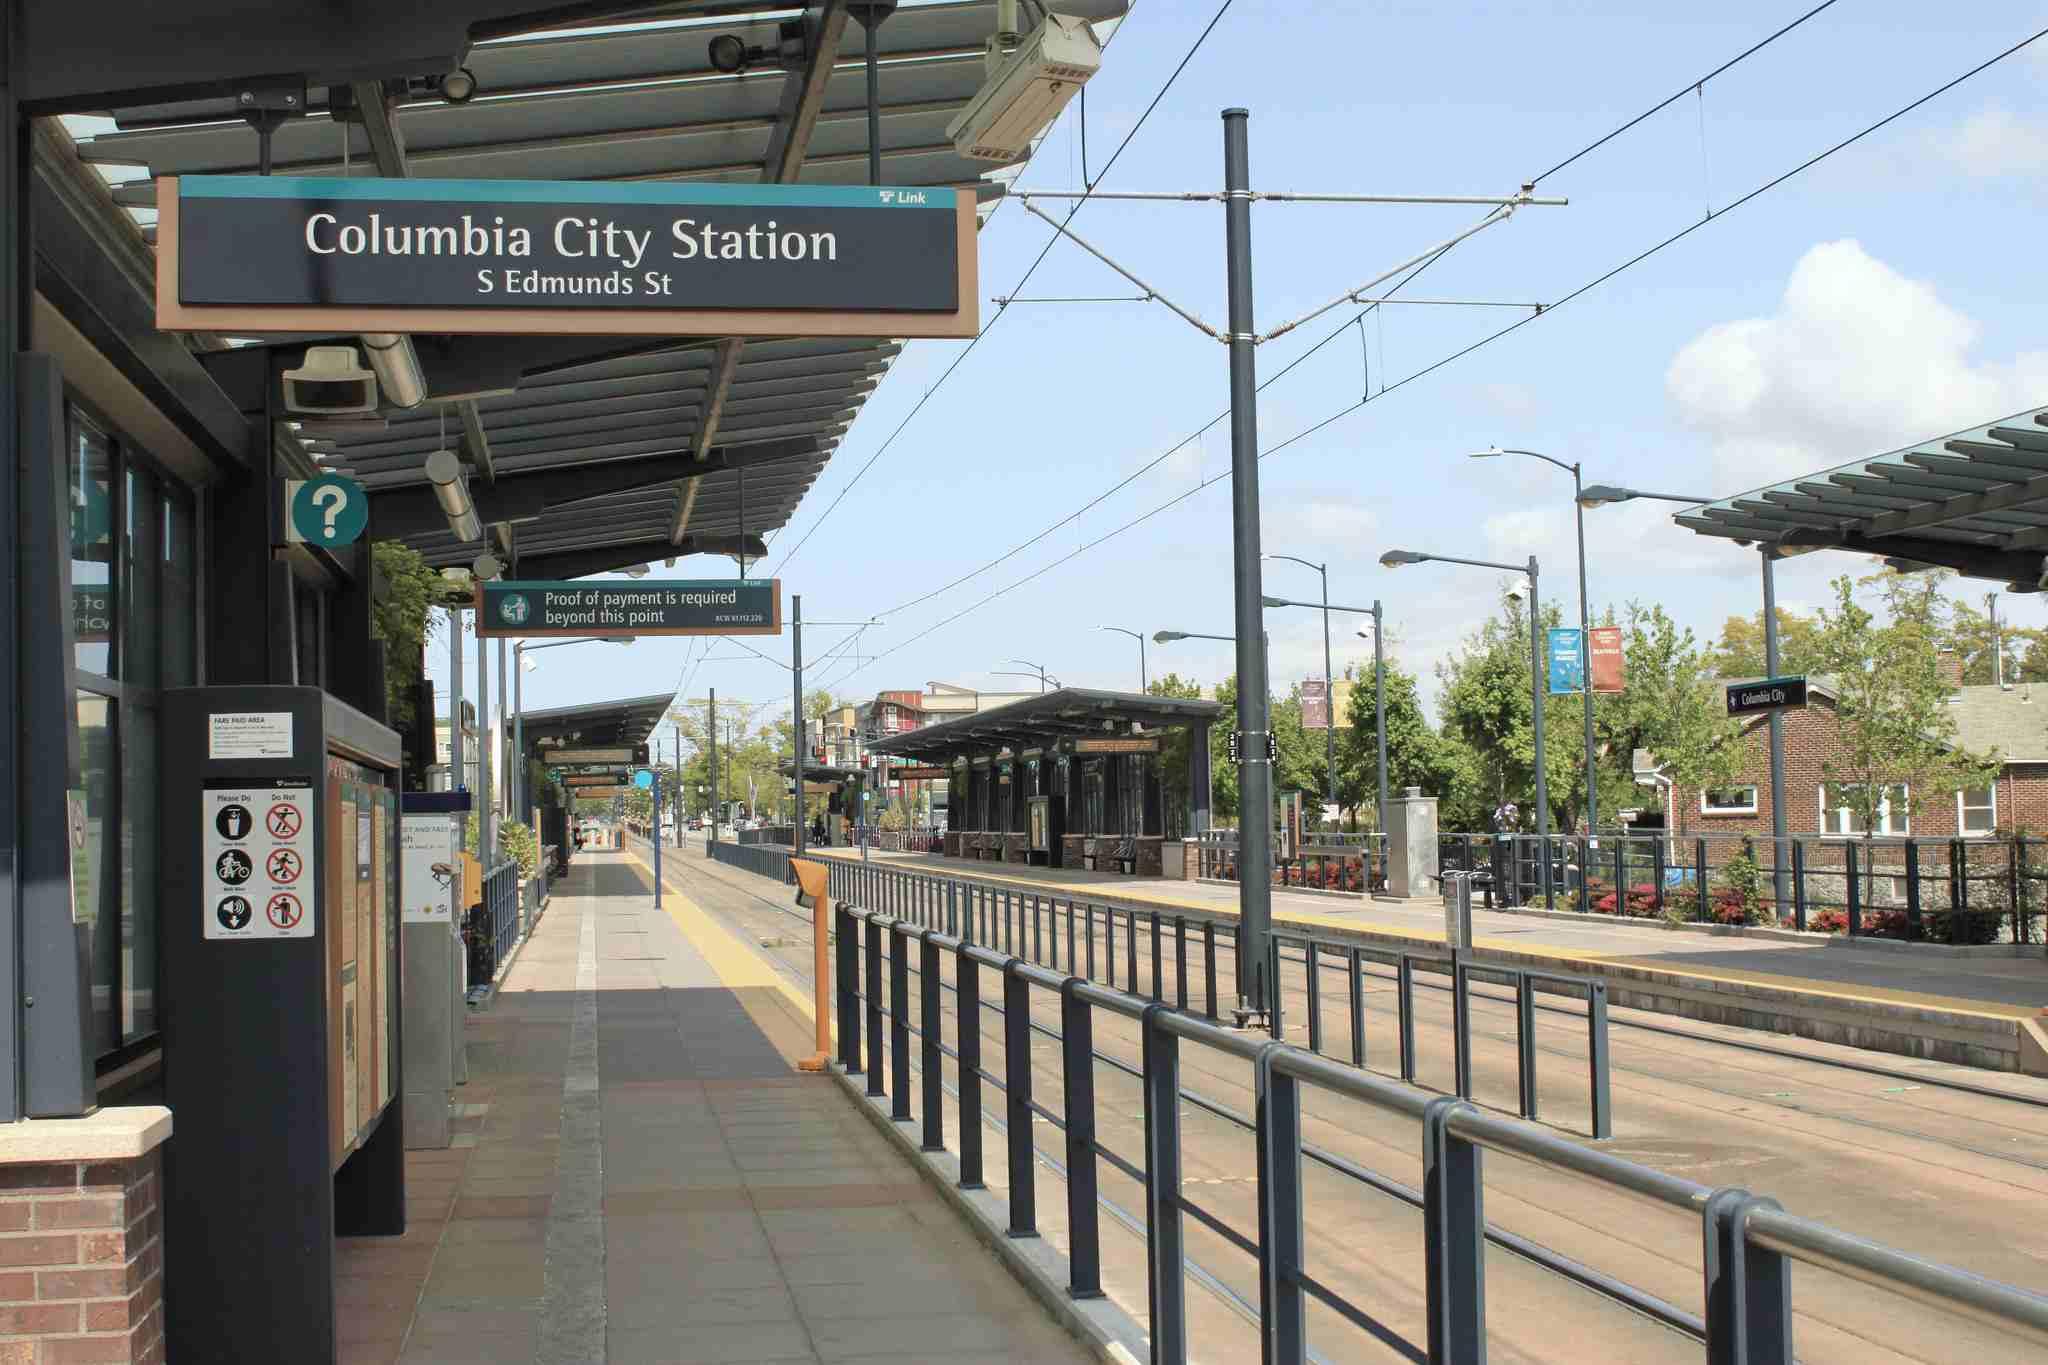 Columbia City Station